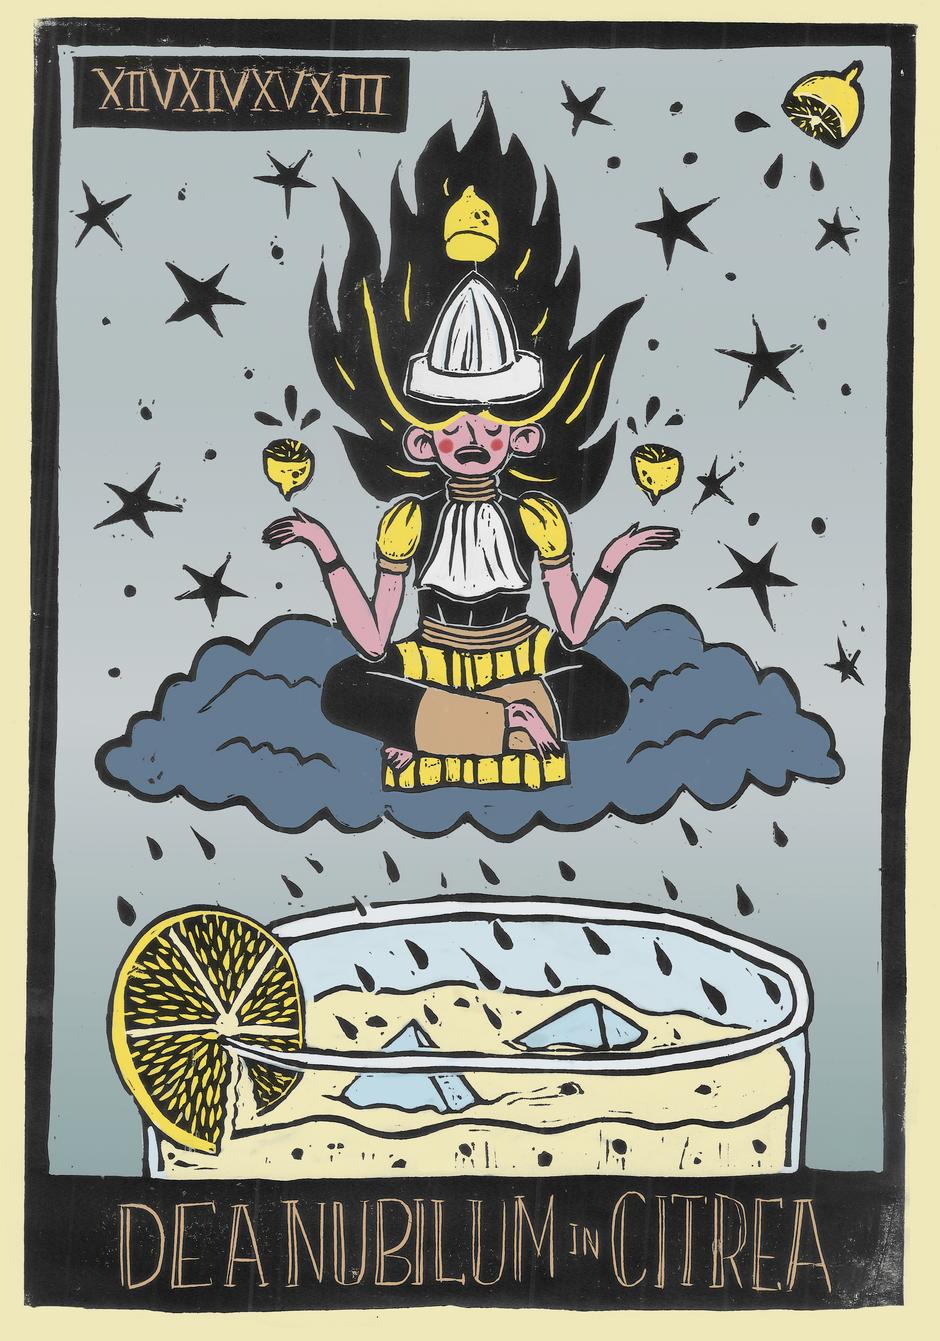 Goddess of the Cloudy Lemon(ade)